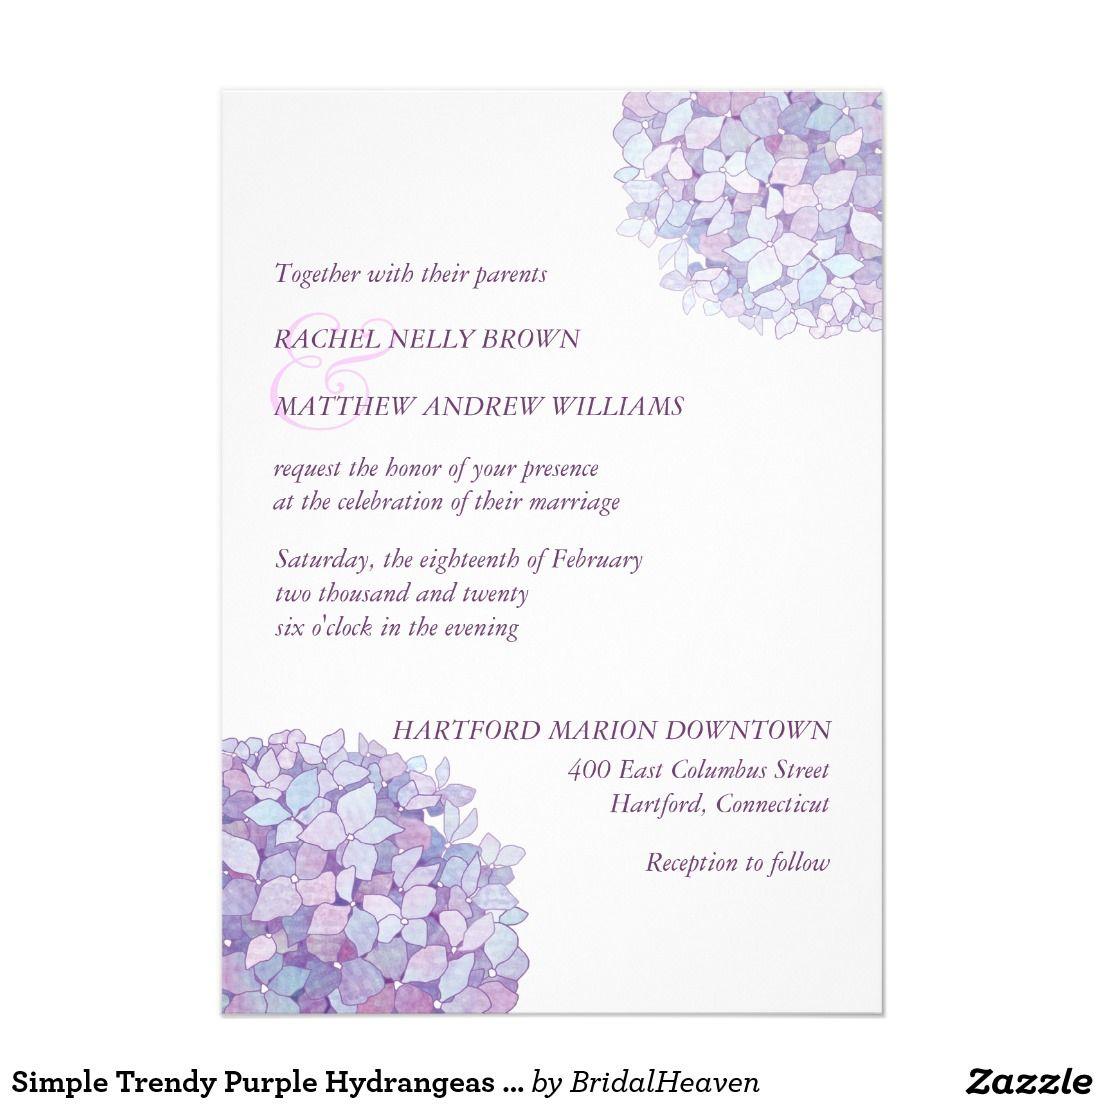 Purple hydrangea wedding invitation sample - Purple Simple Trendy Purple Hydrangeas Wedding Invitation